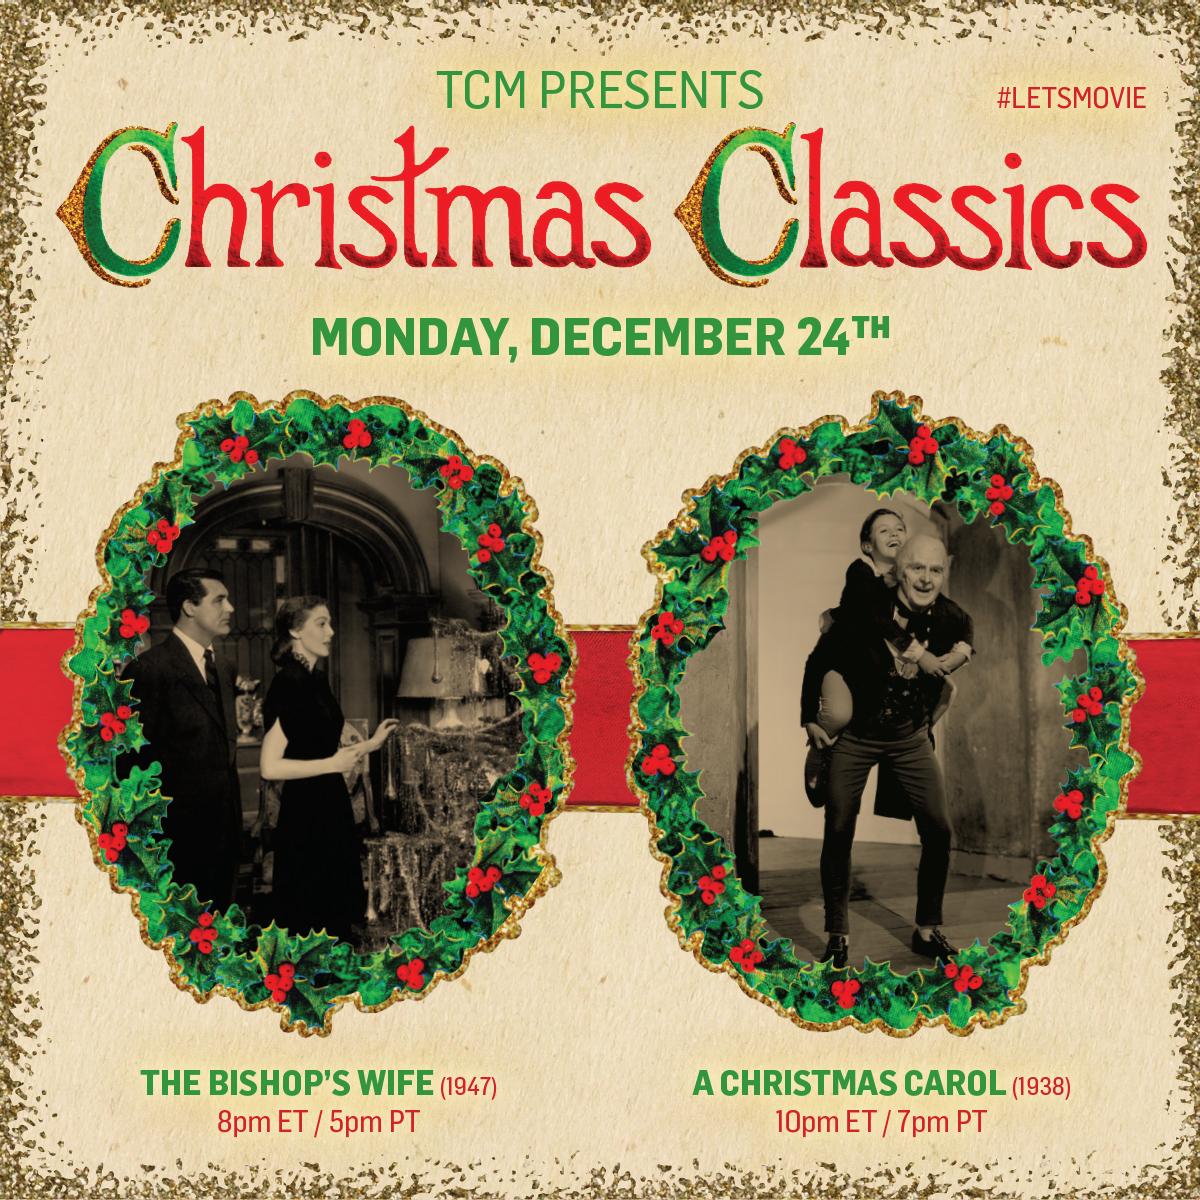 TCM_SocialAssets_18-11_ChristmasClassicsAssets_1200x1200_FNL-Series-9.jpg